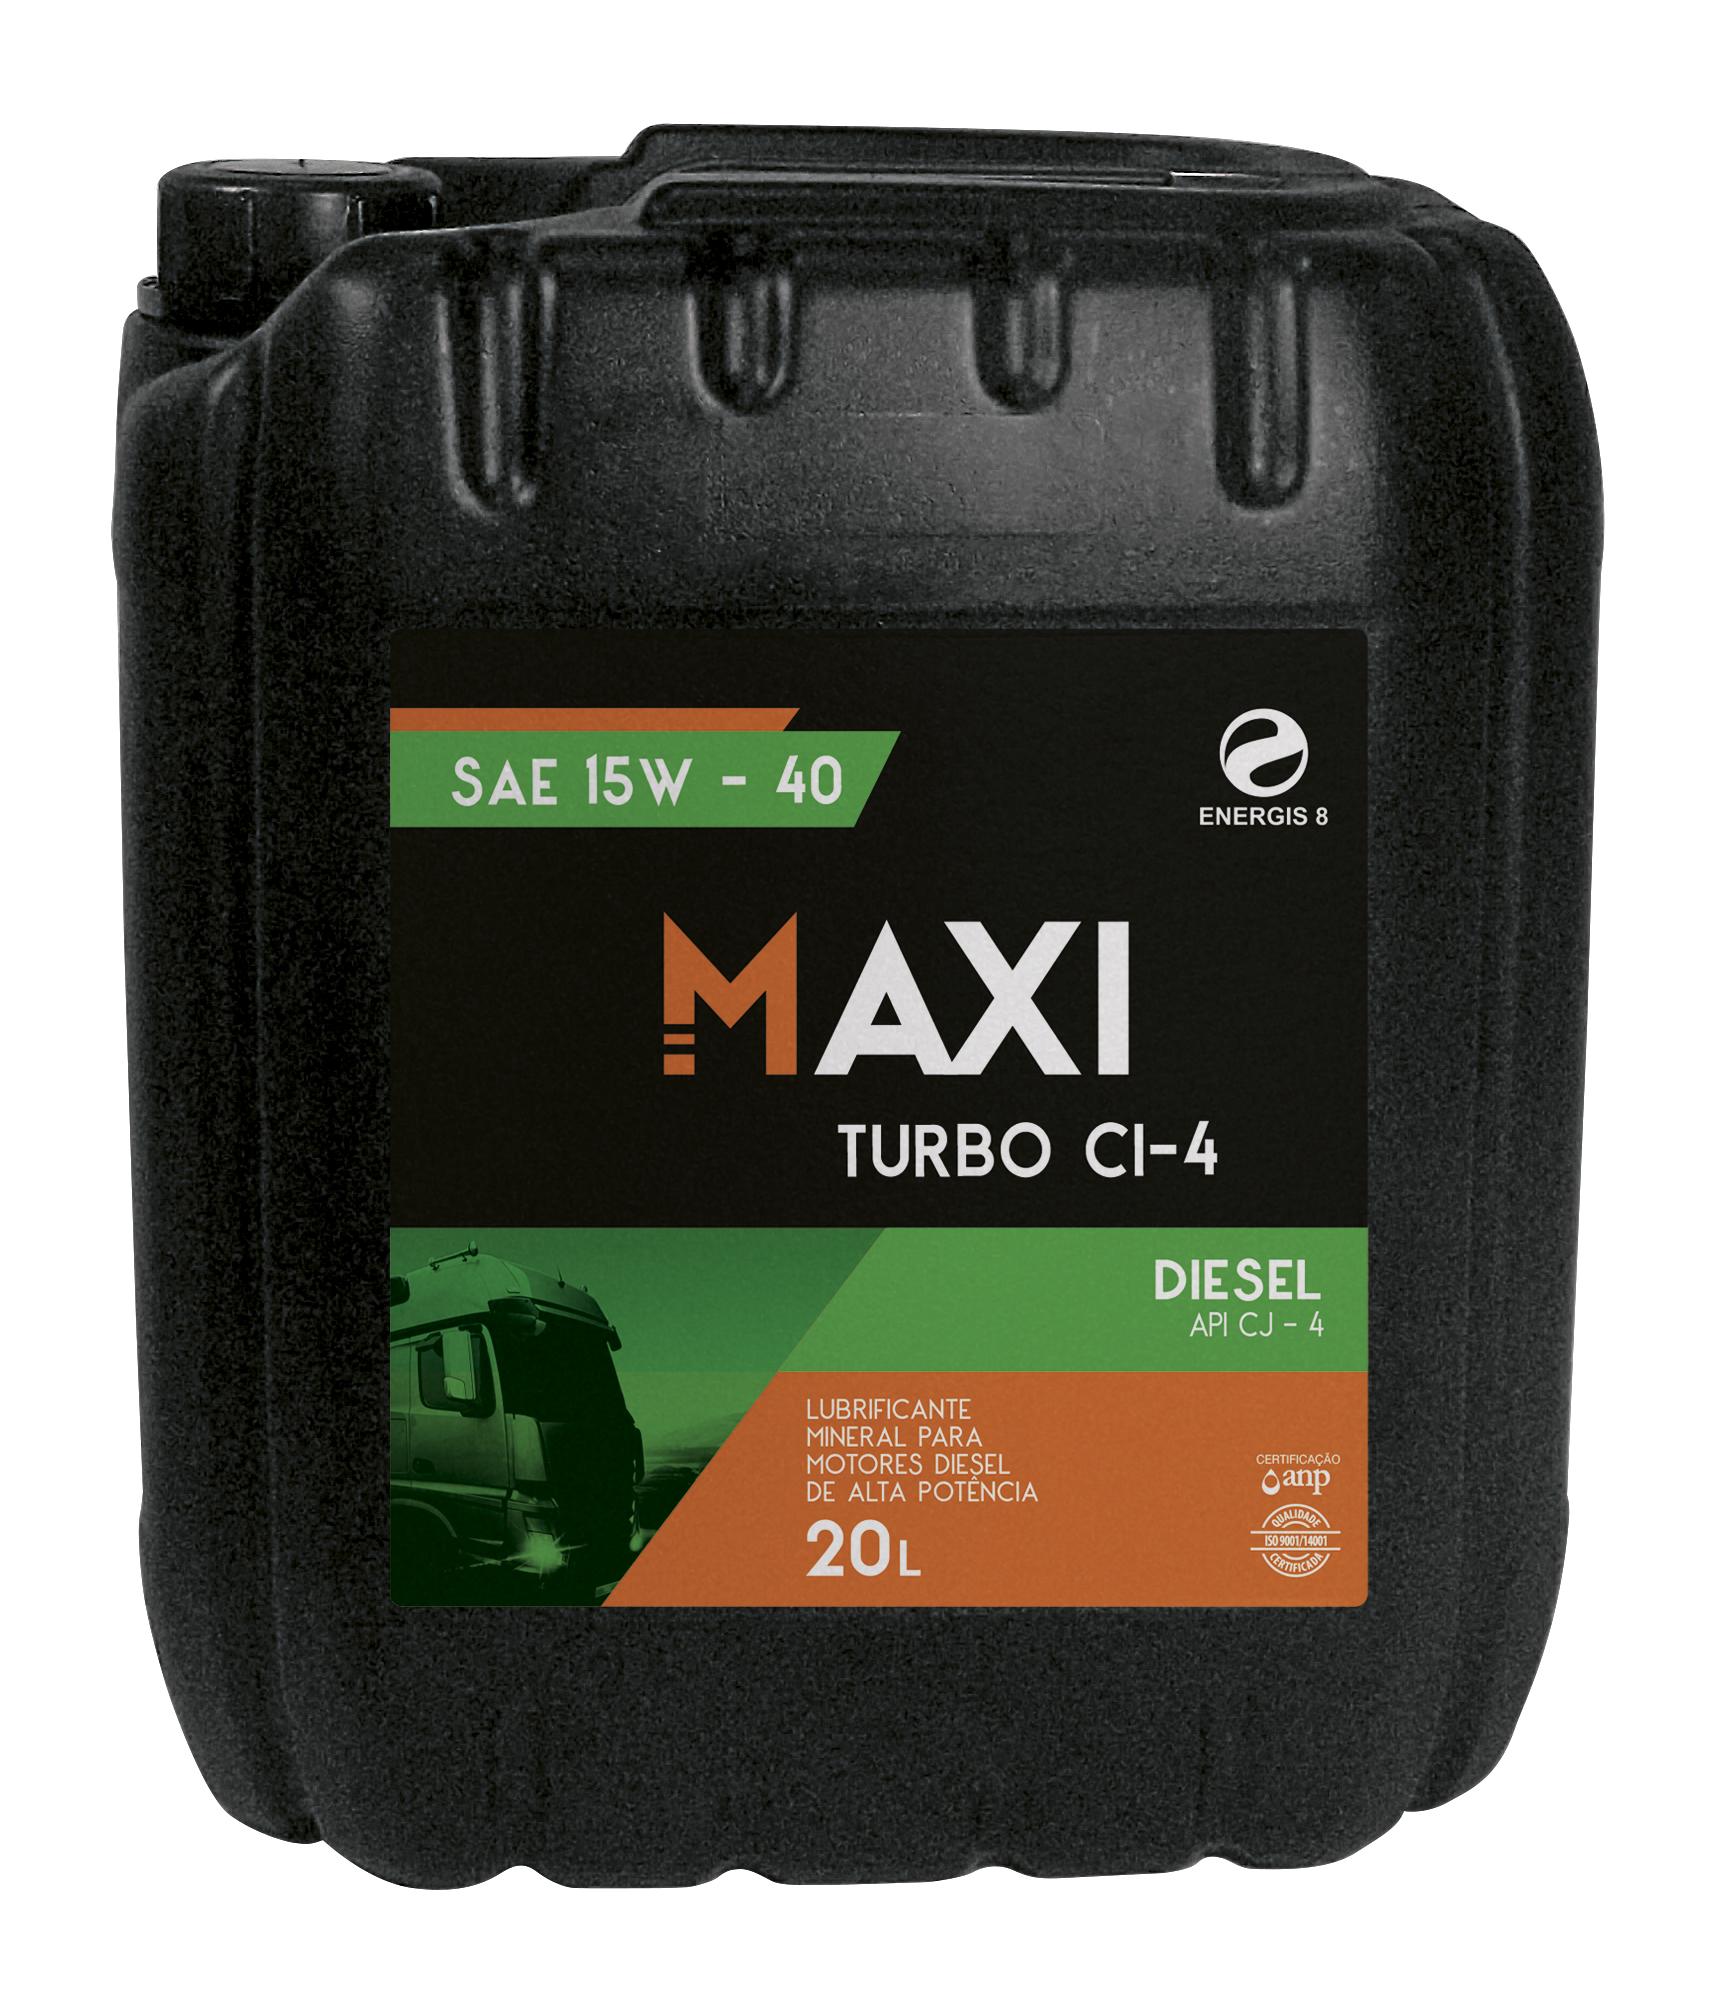 MAXI-TURBO-CI-4_20-litros_Novo